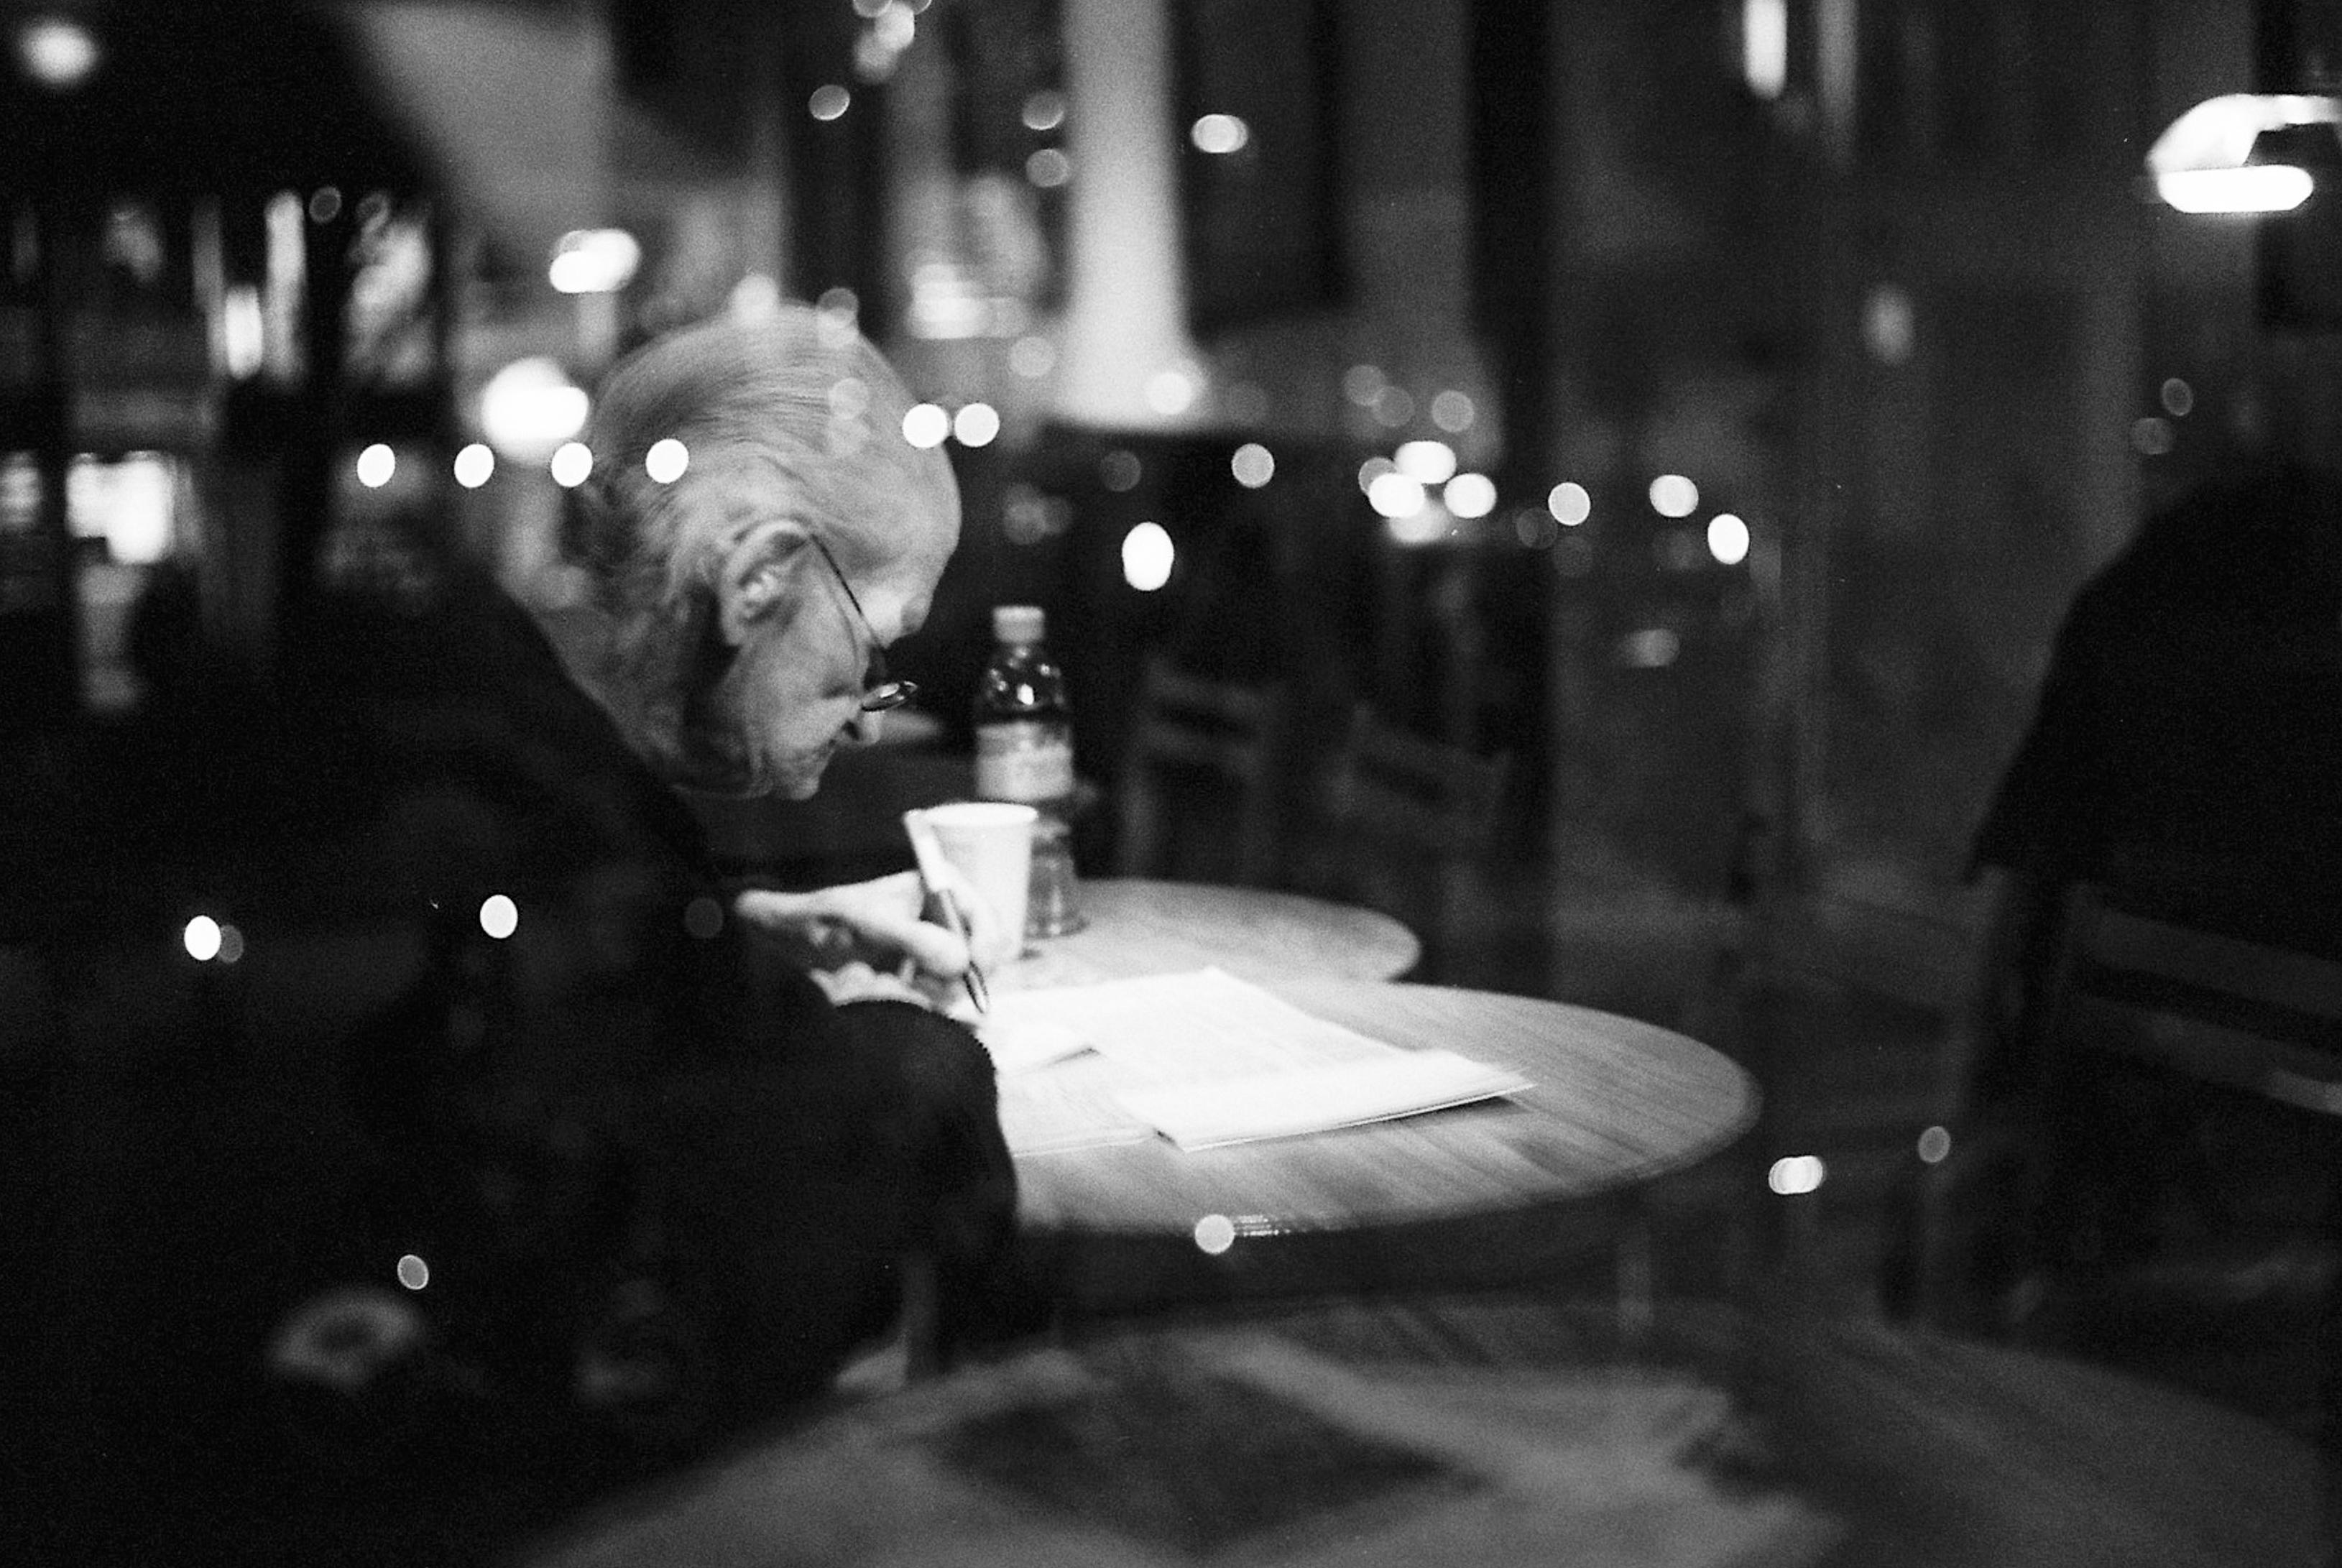 People white black monochrome window night reflection photography table restaurant belgium leica kodak midnight antwerp m6